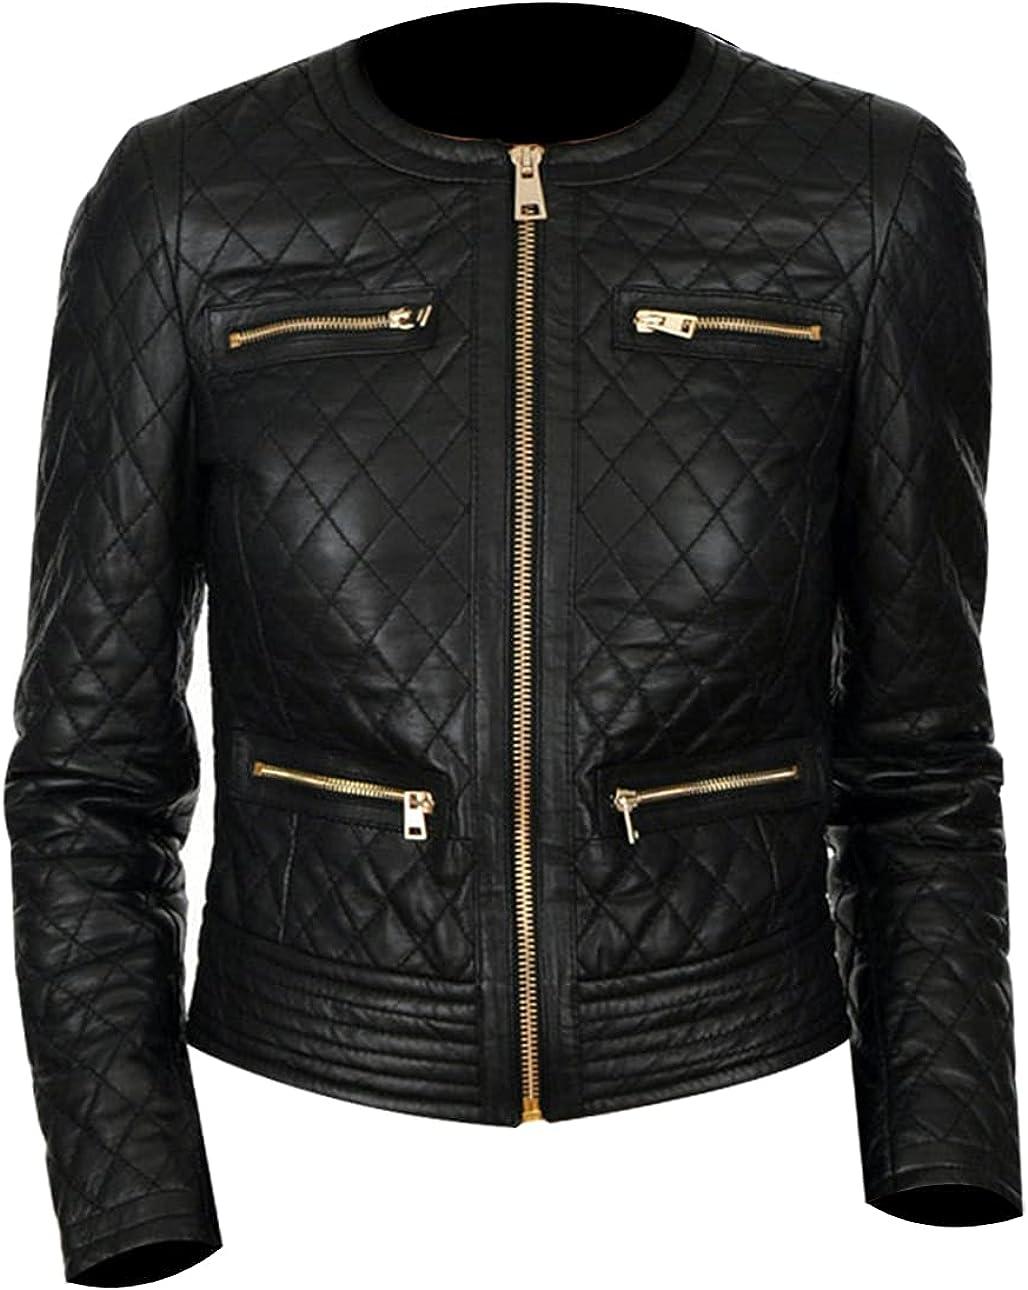 Womens Black Biker Quilted Leather Jacket - Ladies Short Motorcycle Jacket